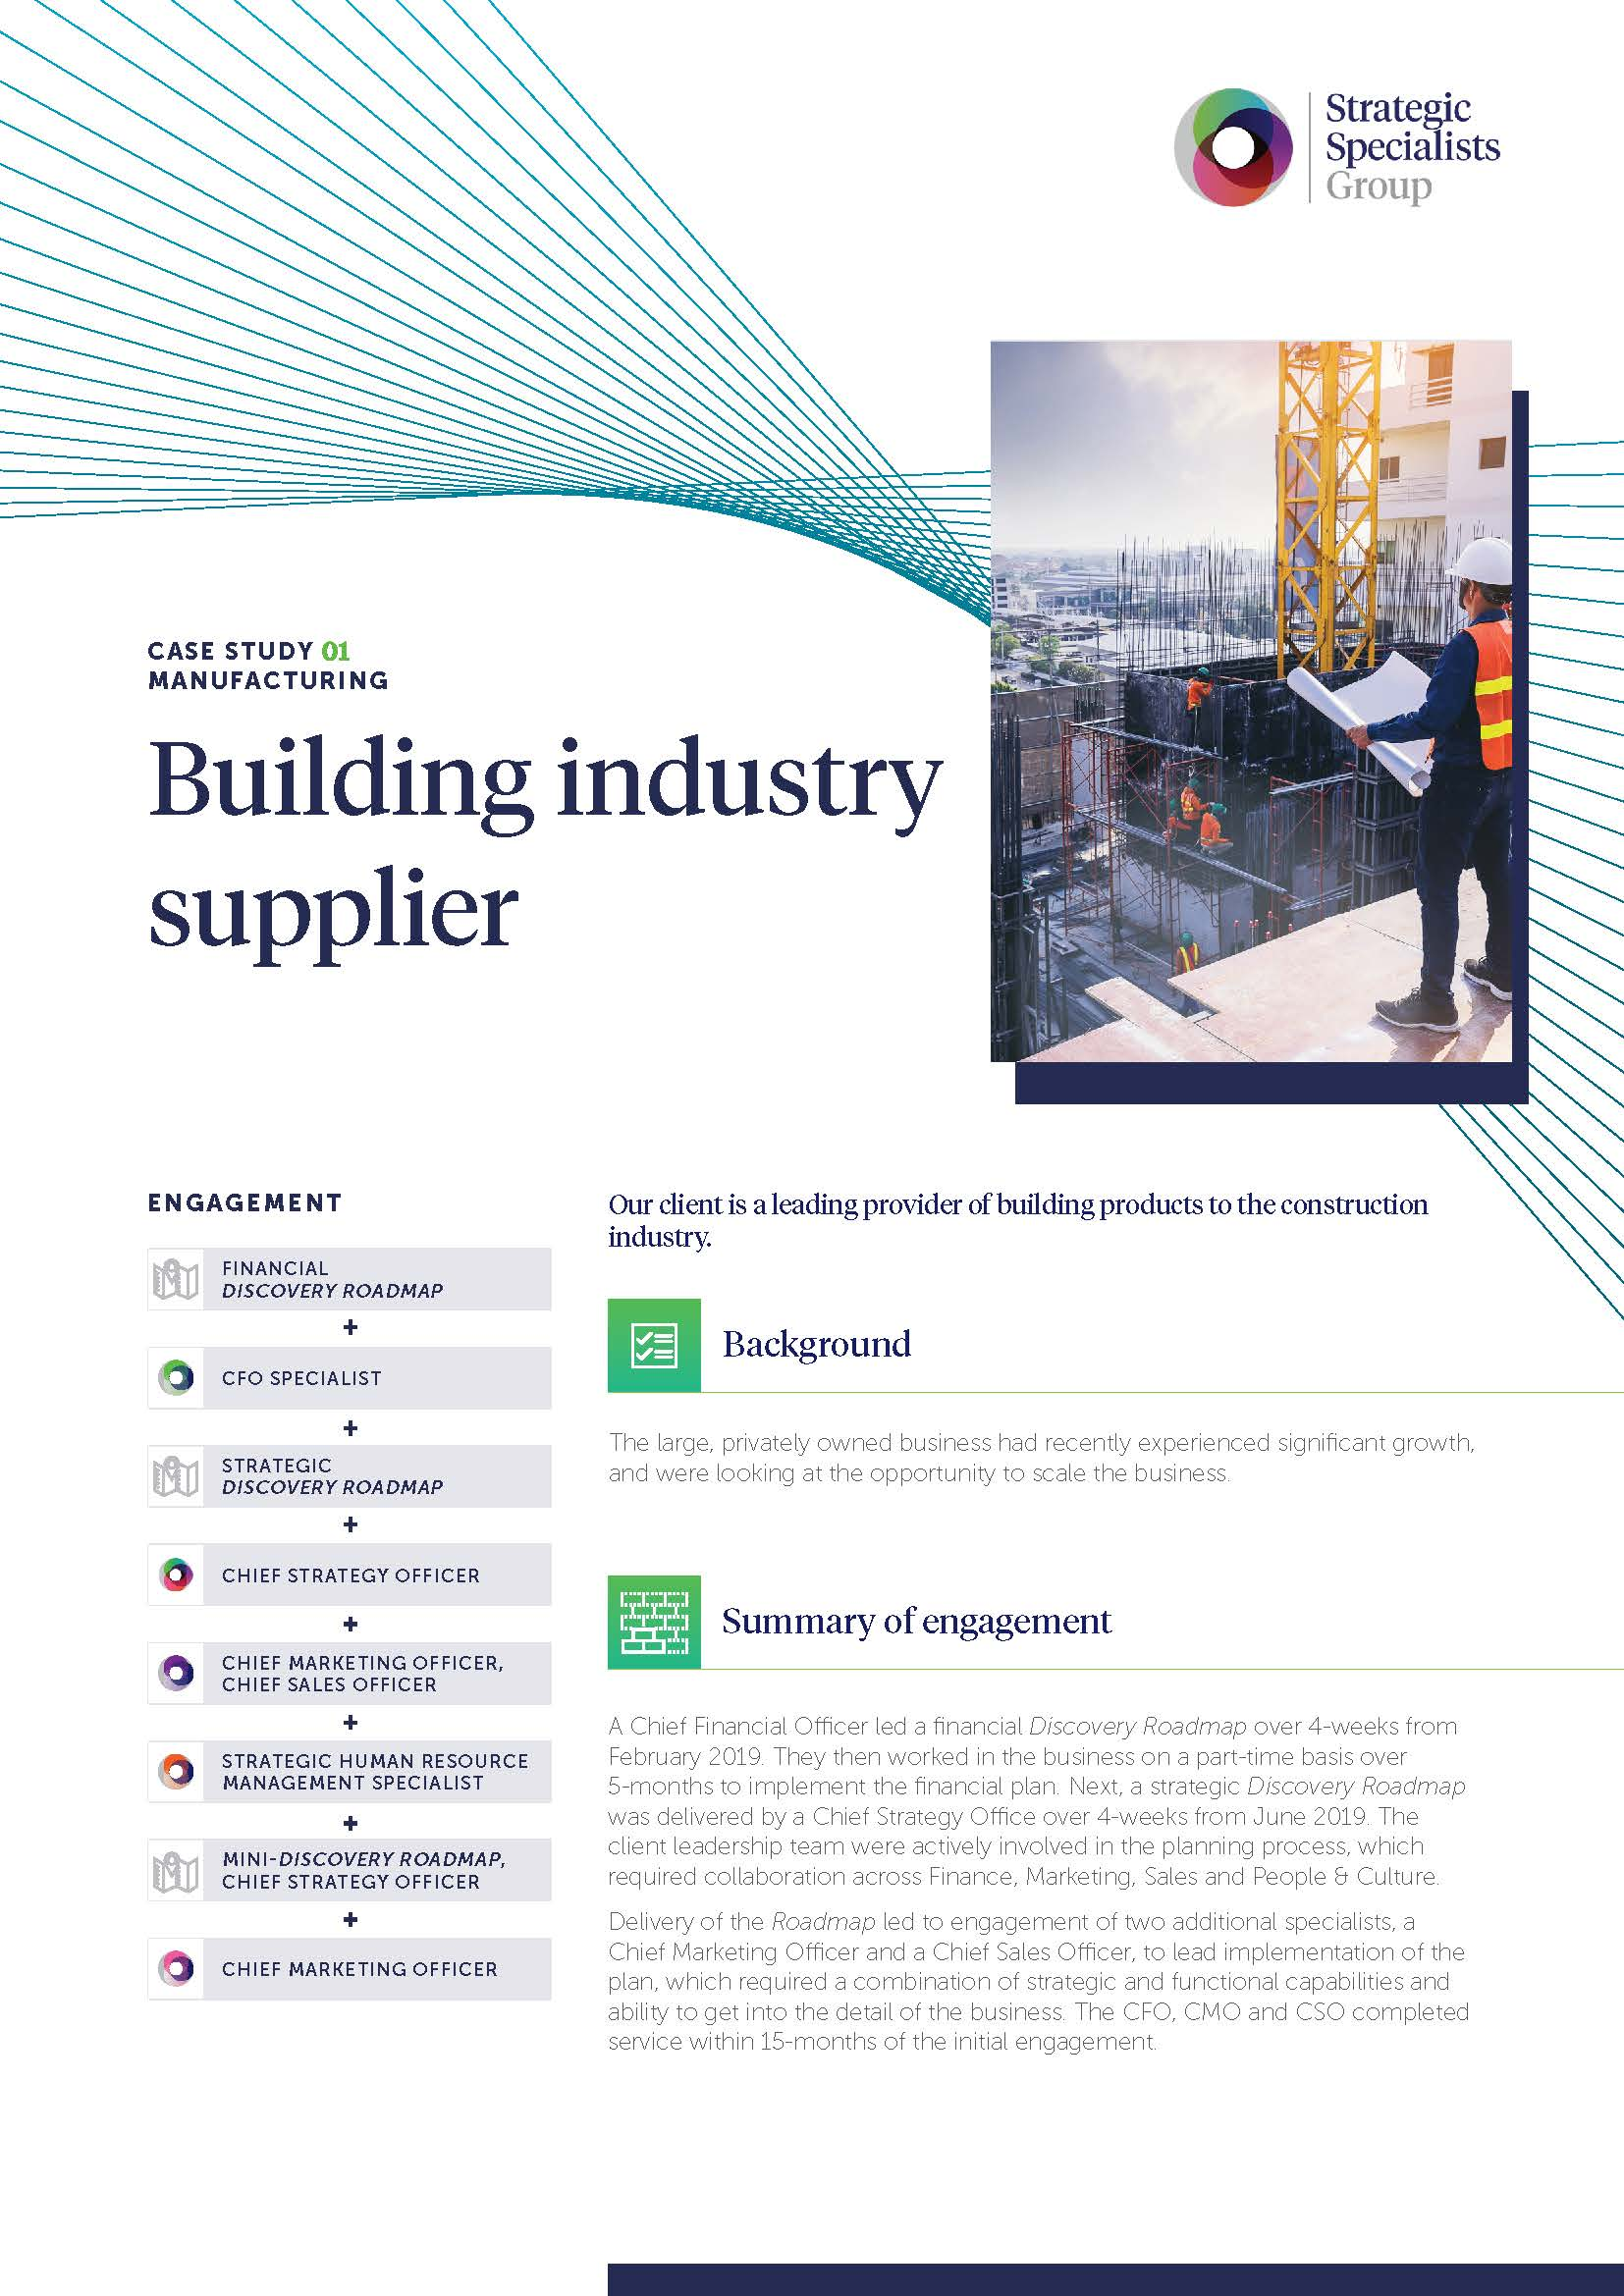 01_BuildingIndustrySupplier_Case_Study_SSG_Page_1